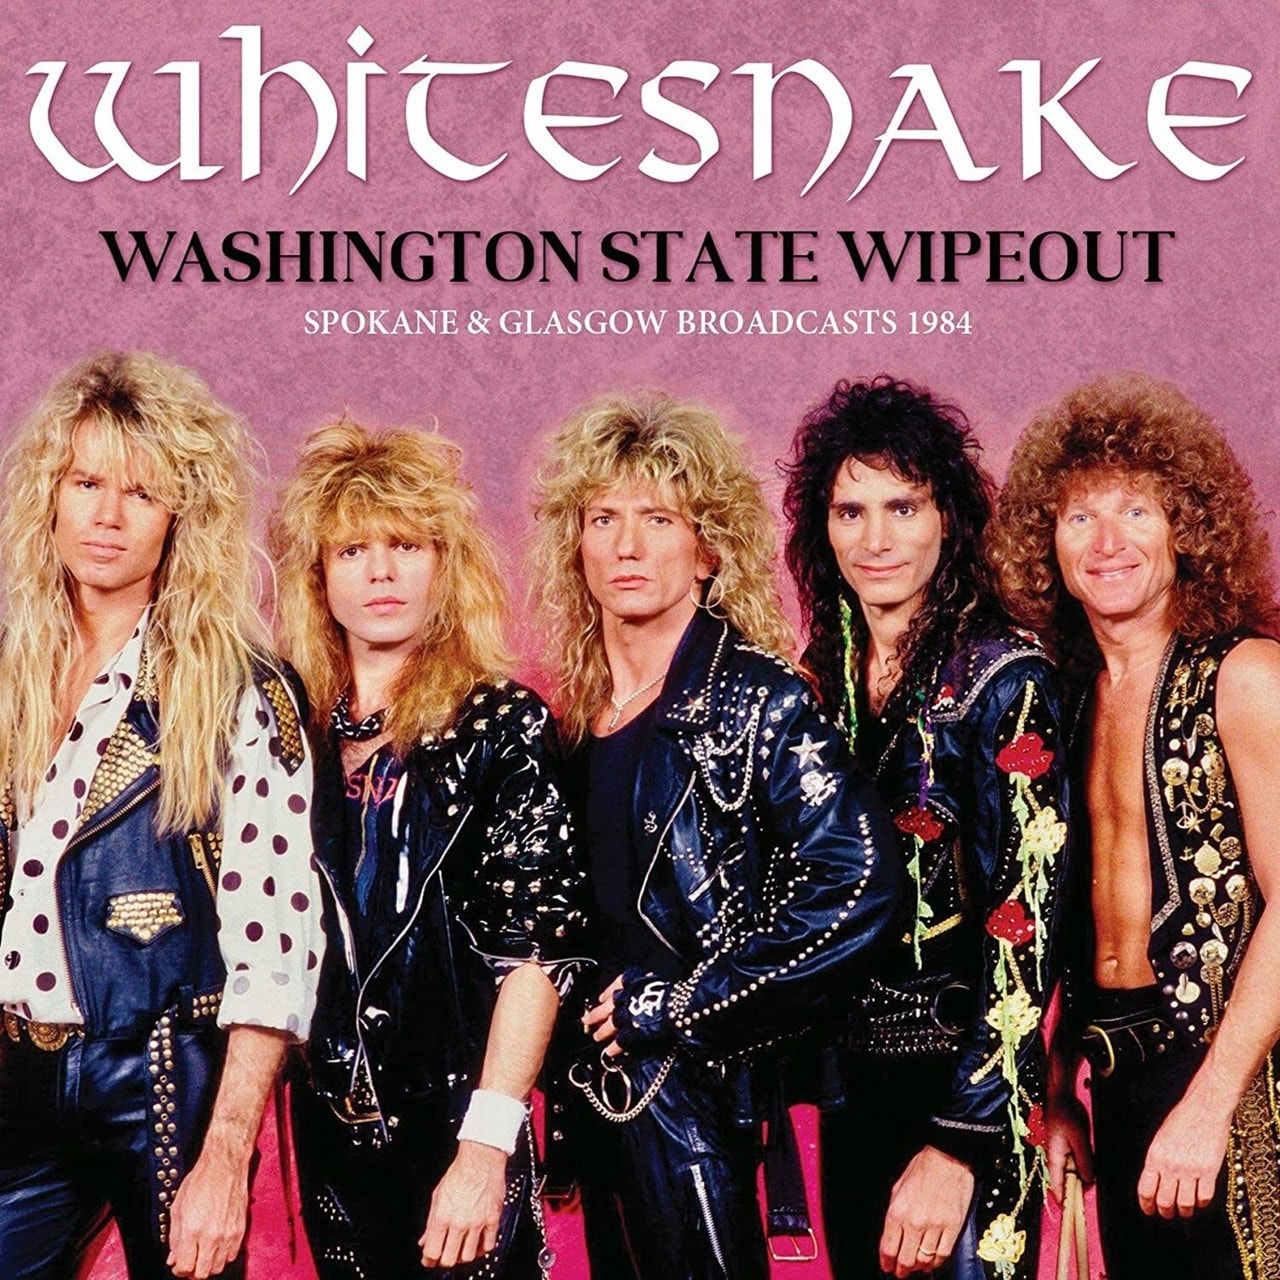 Washington State Wipeout: Spokane & Glasgow Broadcasts 1984 - 1